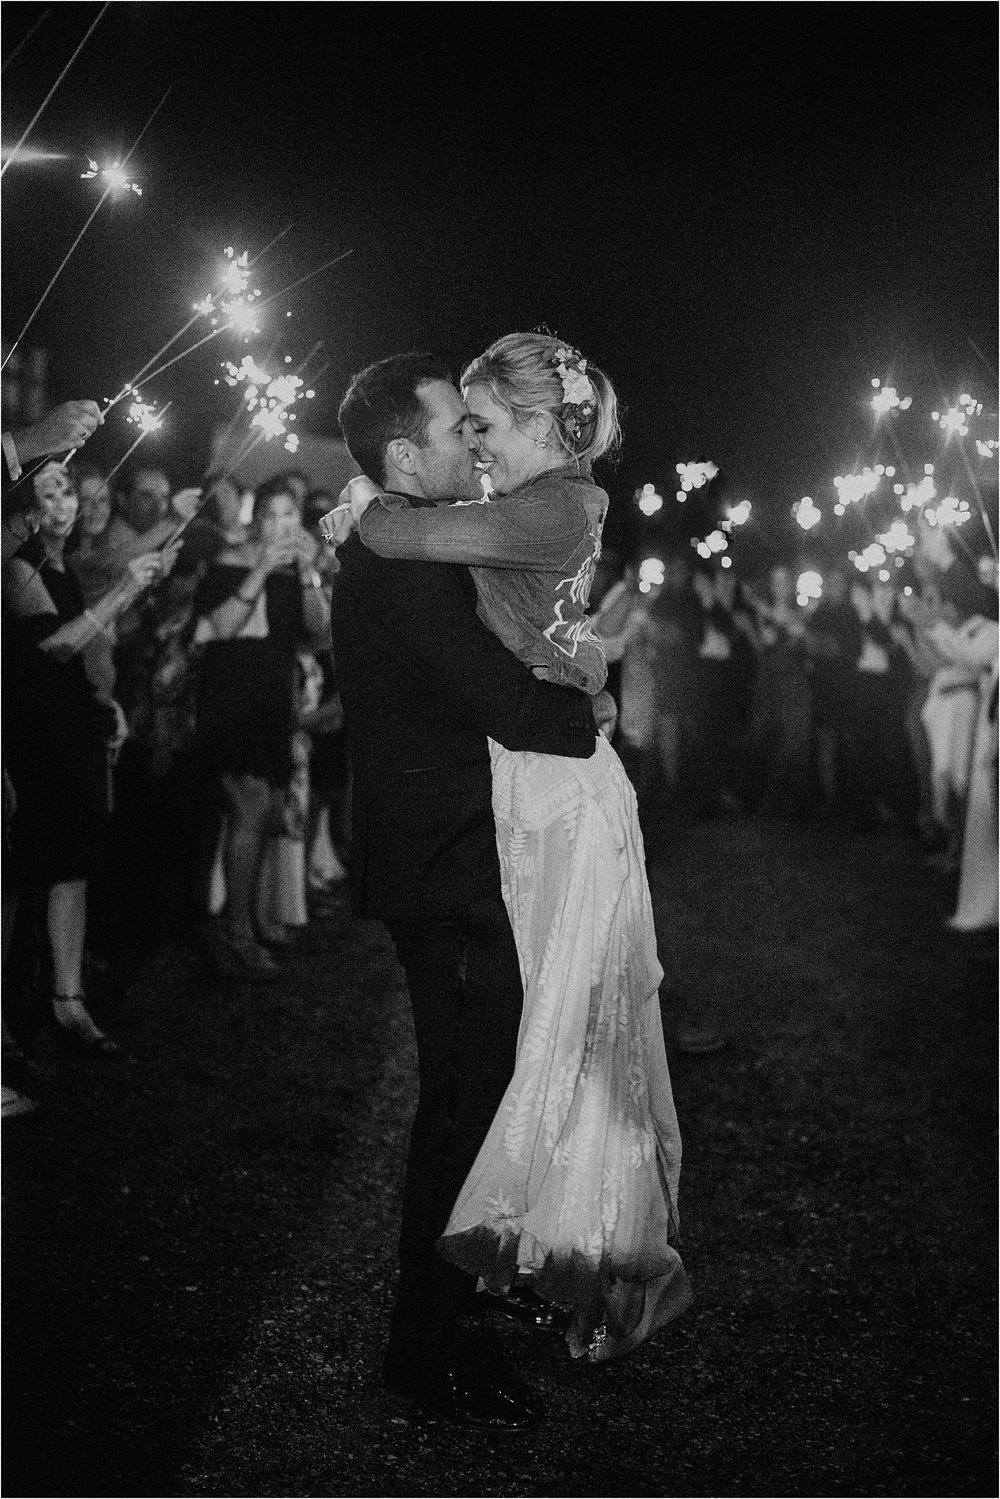 Sarah_Brookhart_Hortulus_Farm_Garden_and_Nursey_Wedding_Photographer_0083.jpg